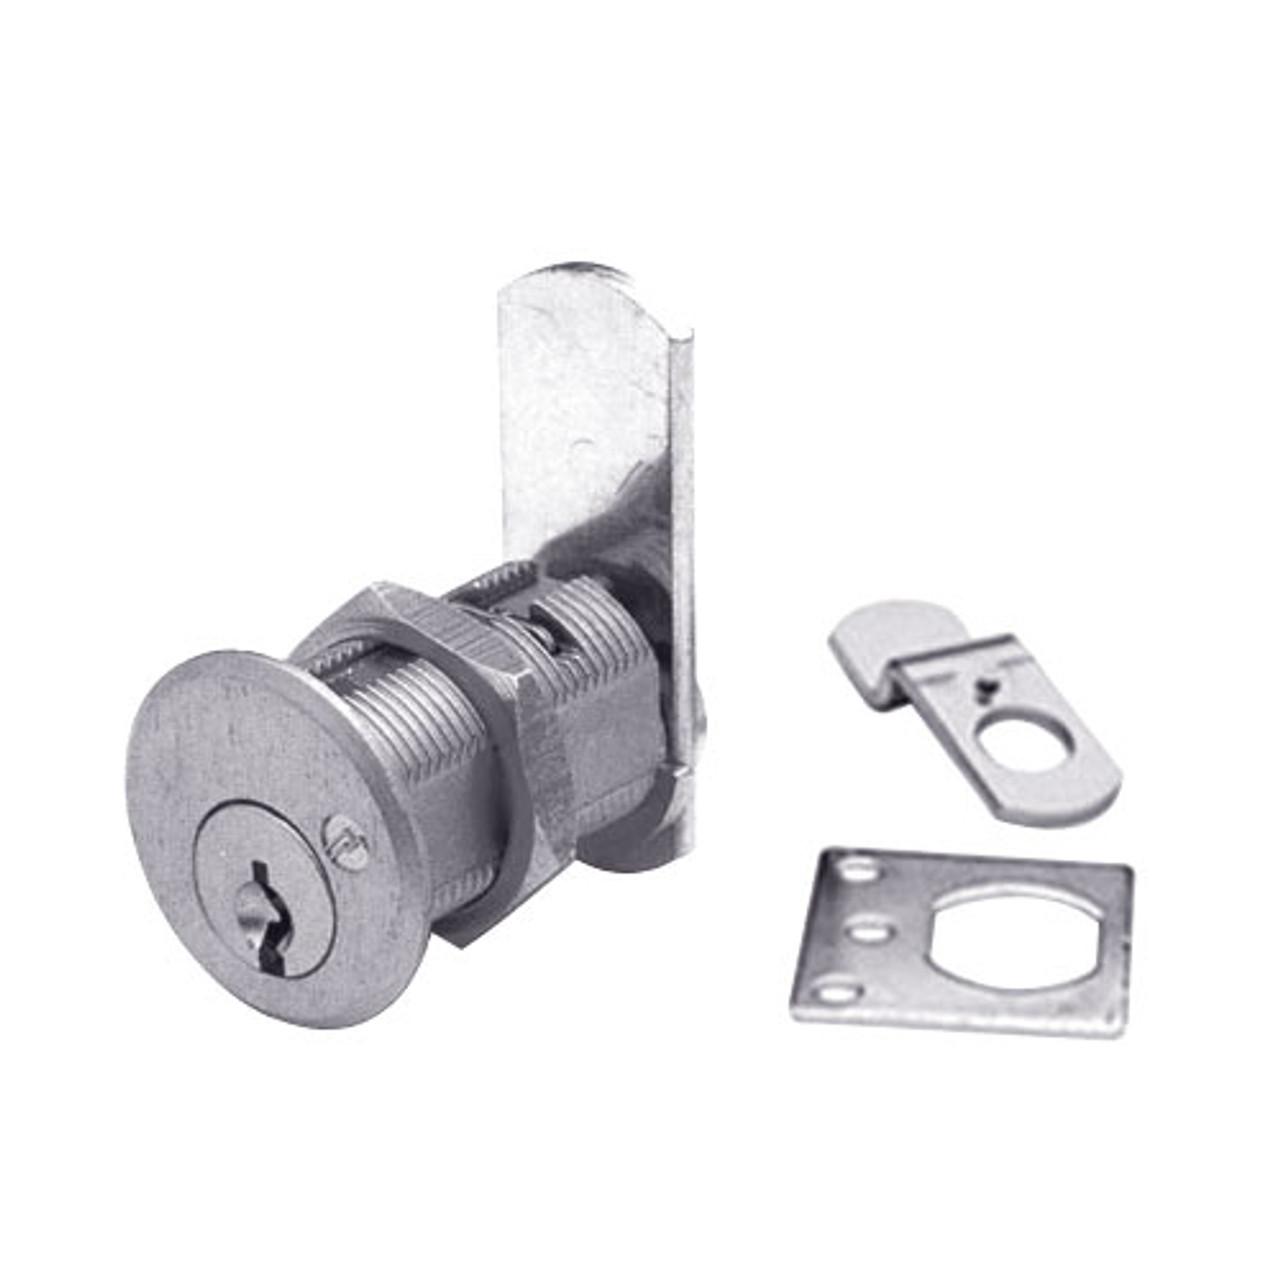 Olympus DCN3-KA101-26D Cam Locks in Satin Chrome Finish